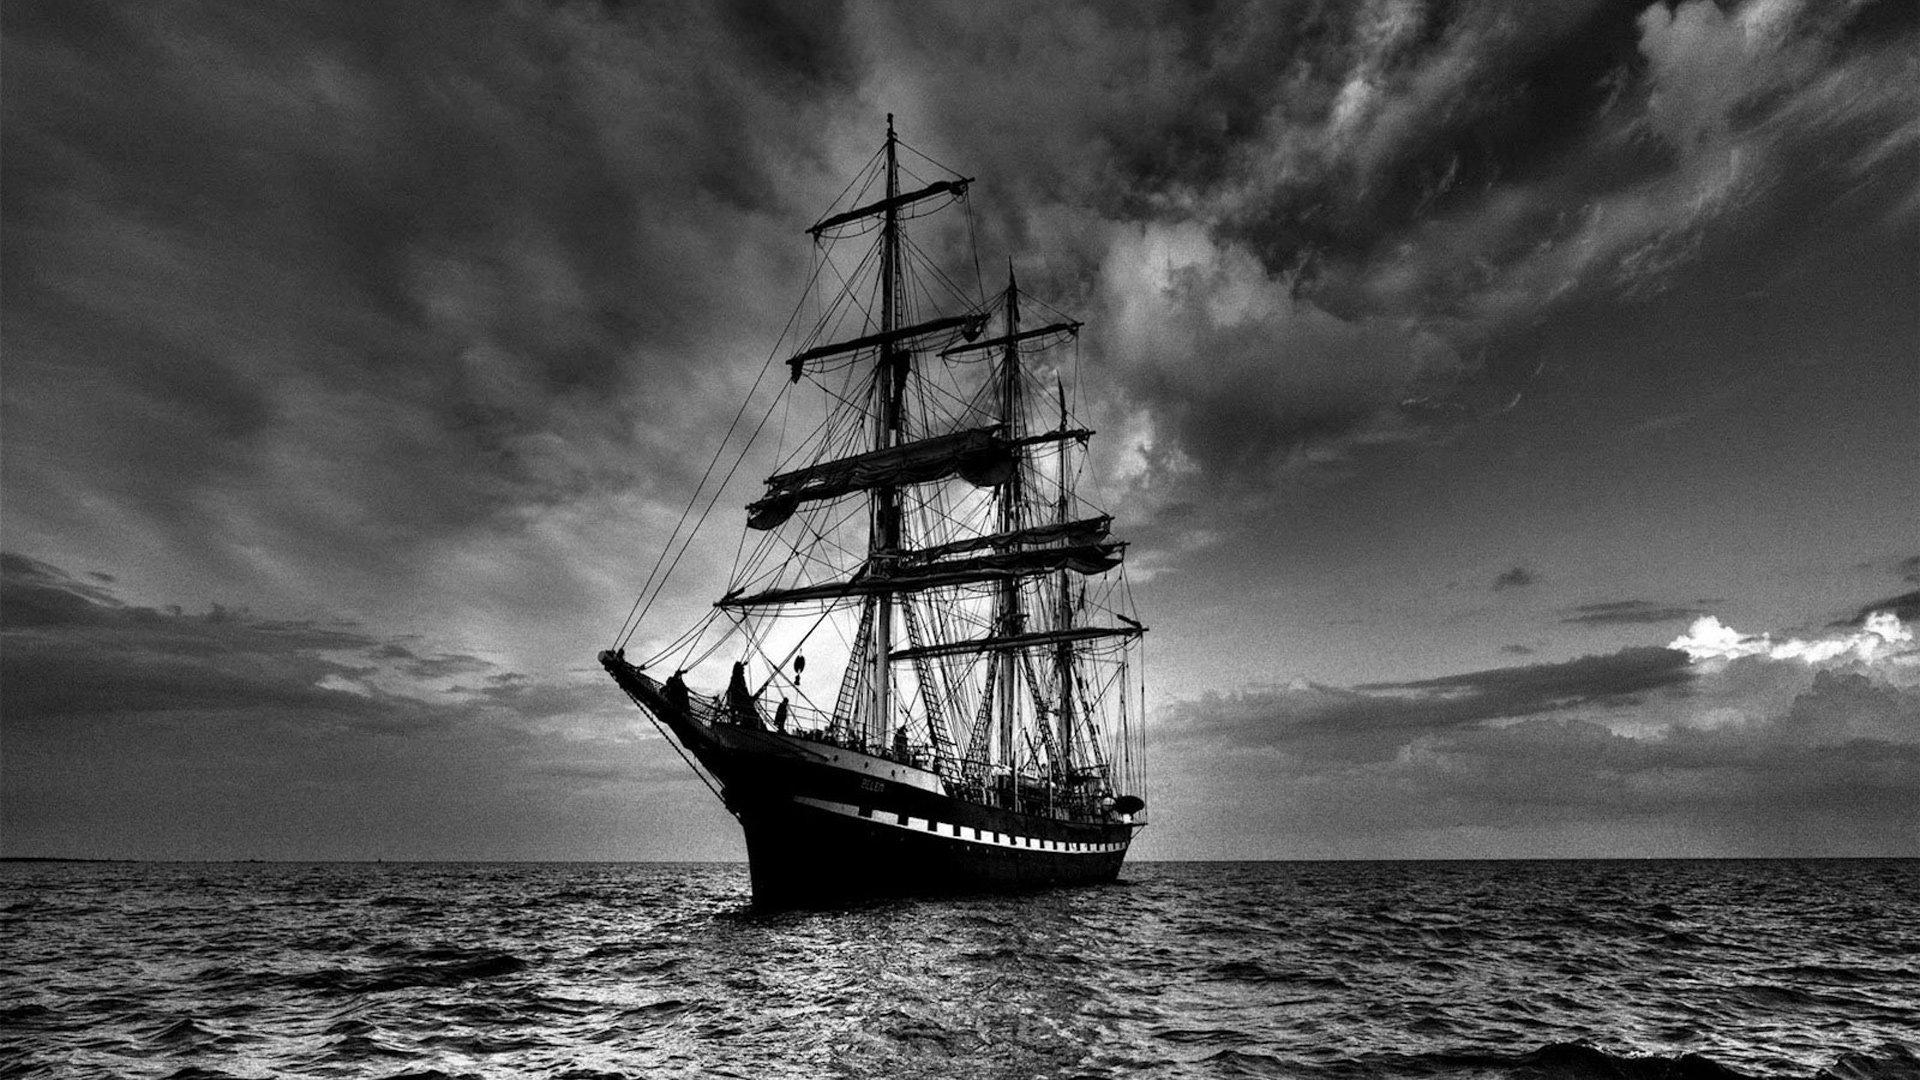 Sailing Quotes Quotesgram: Quotes On Your Sailing Ship. QuotesGram